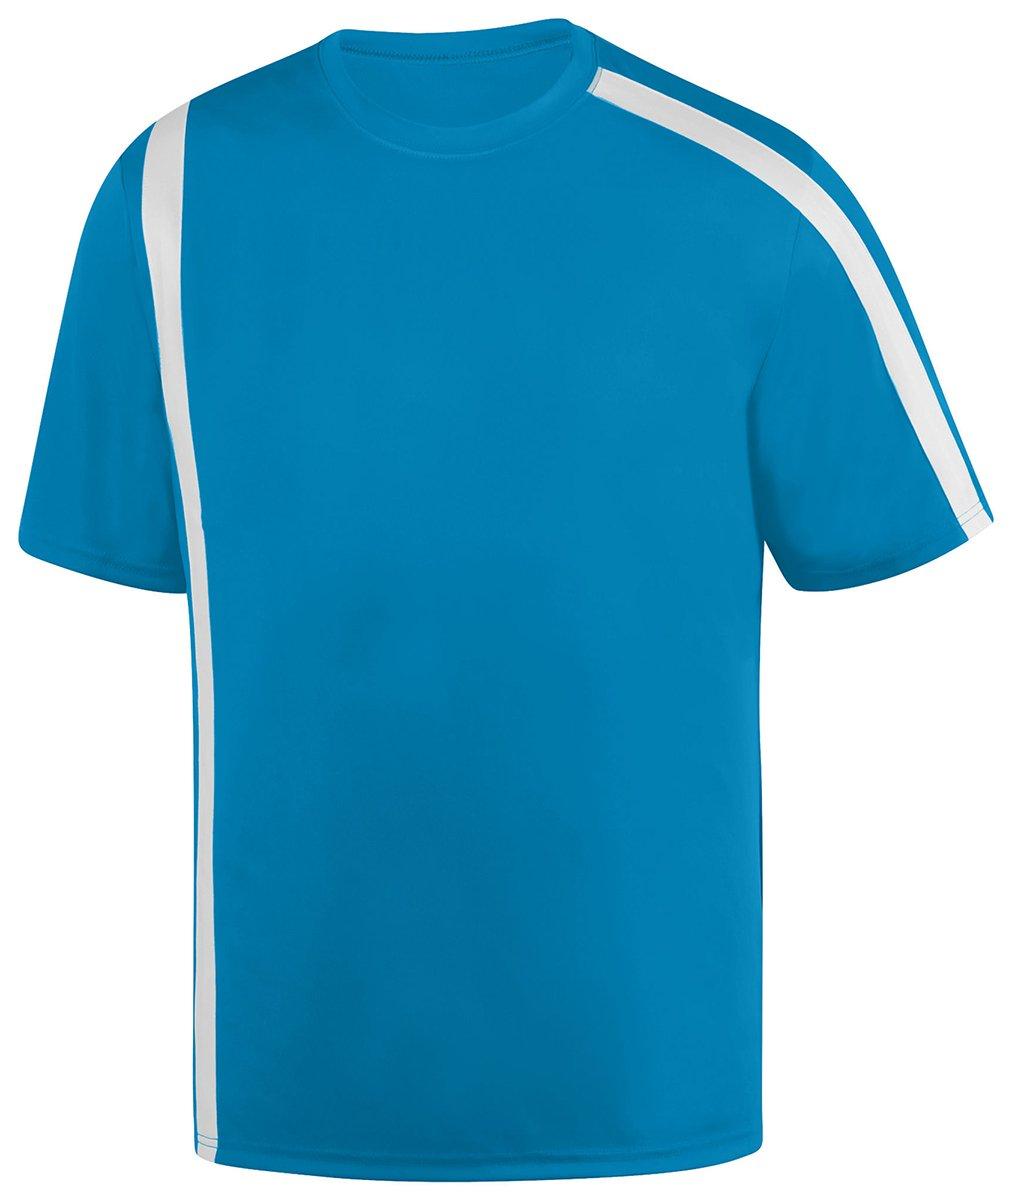 Augusta SportswearメンズAttacking Third Jersey B01EG8A3WQコロンビアブルー/ホワイト XLarge